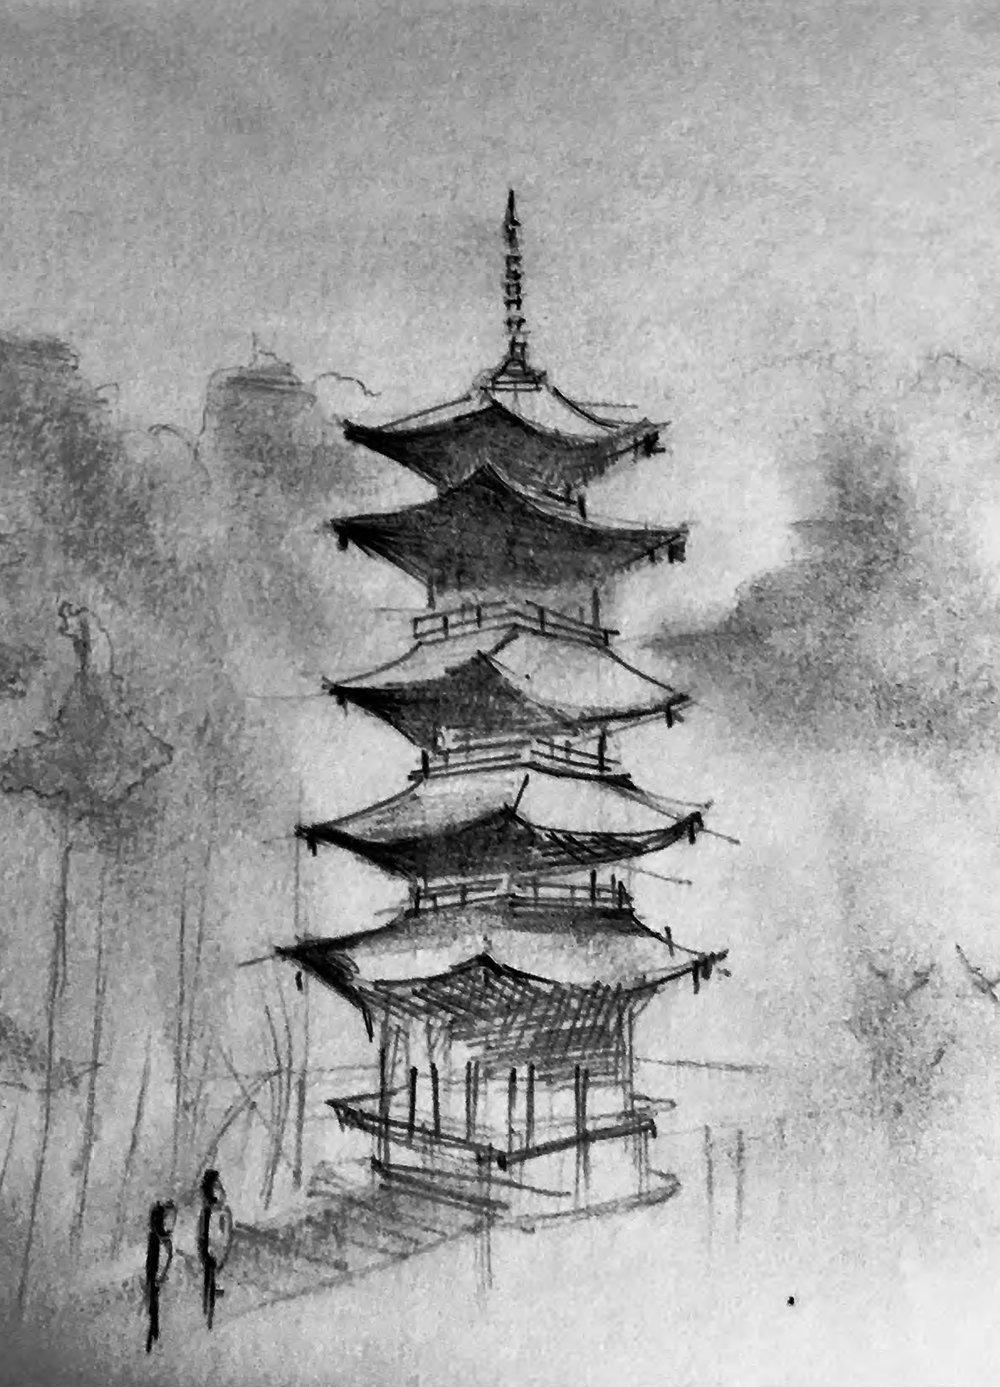 - Left: Myint San Aung, Kyoto PagodaBelow: Myint San Aung, Murin-an GardenJordan Draffin, Shigemori Mirei Residence